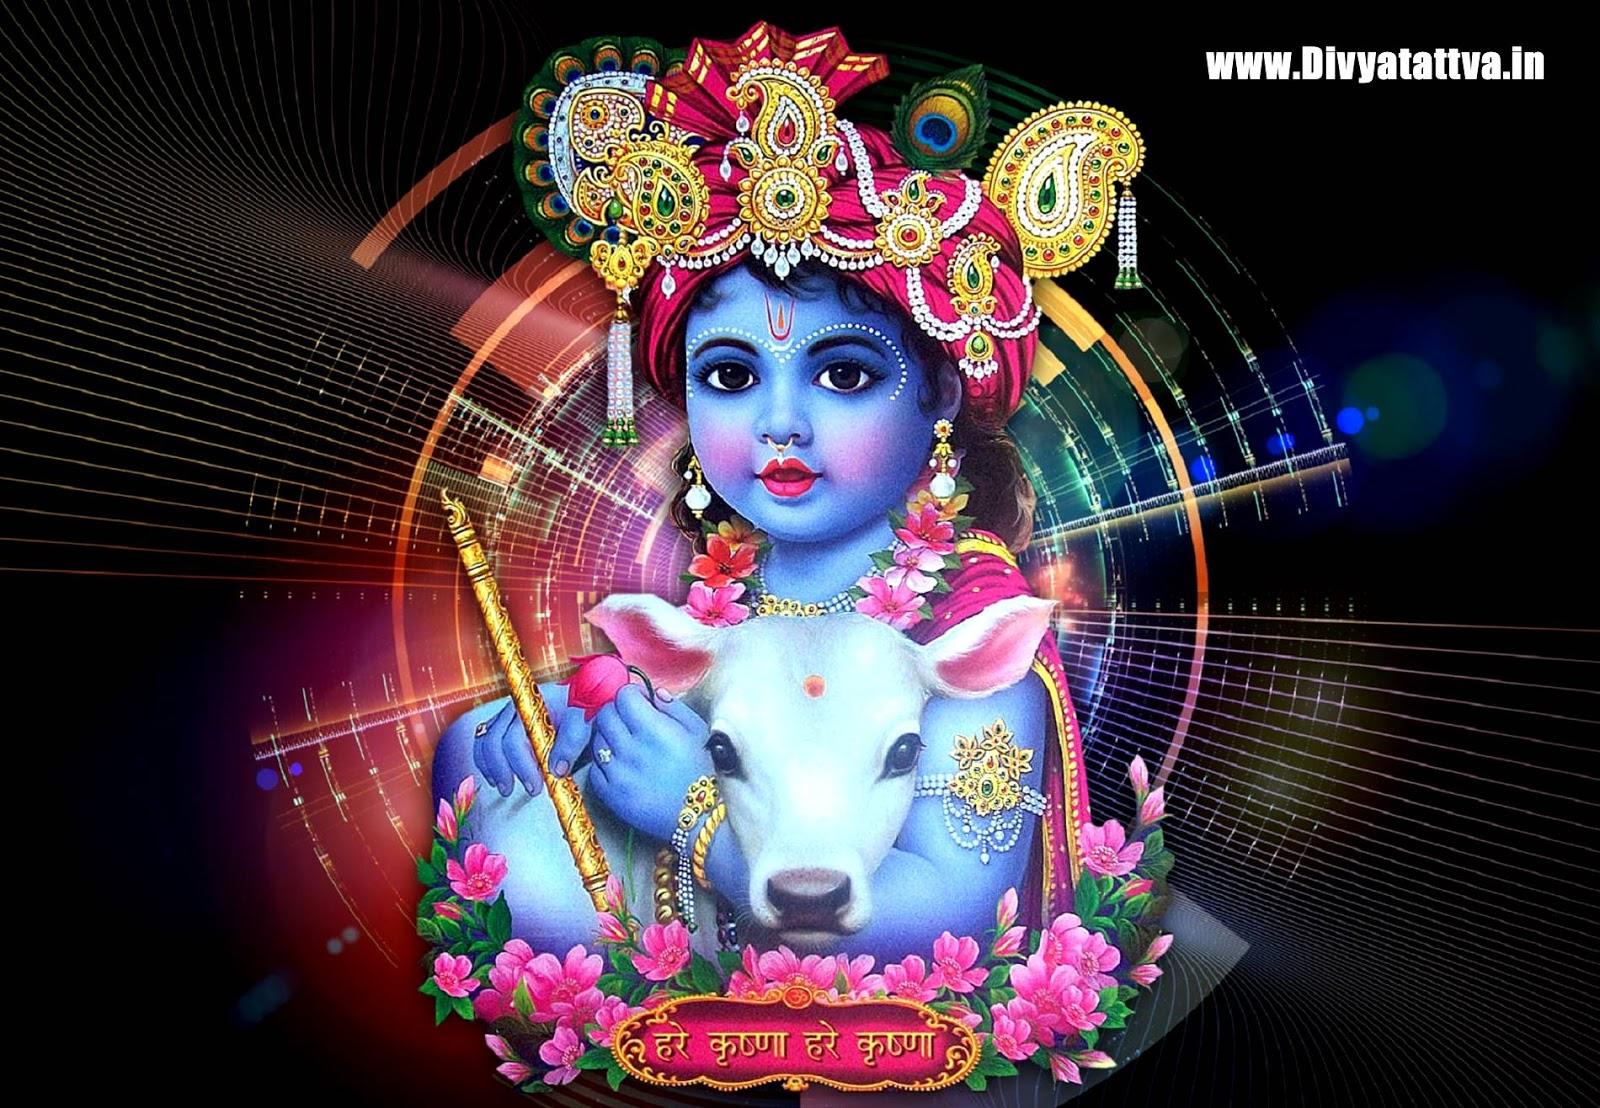 Shree Bal Gopal Bhagvan Full Hd Wallpaper Posted By Michelle Thompson